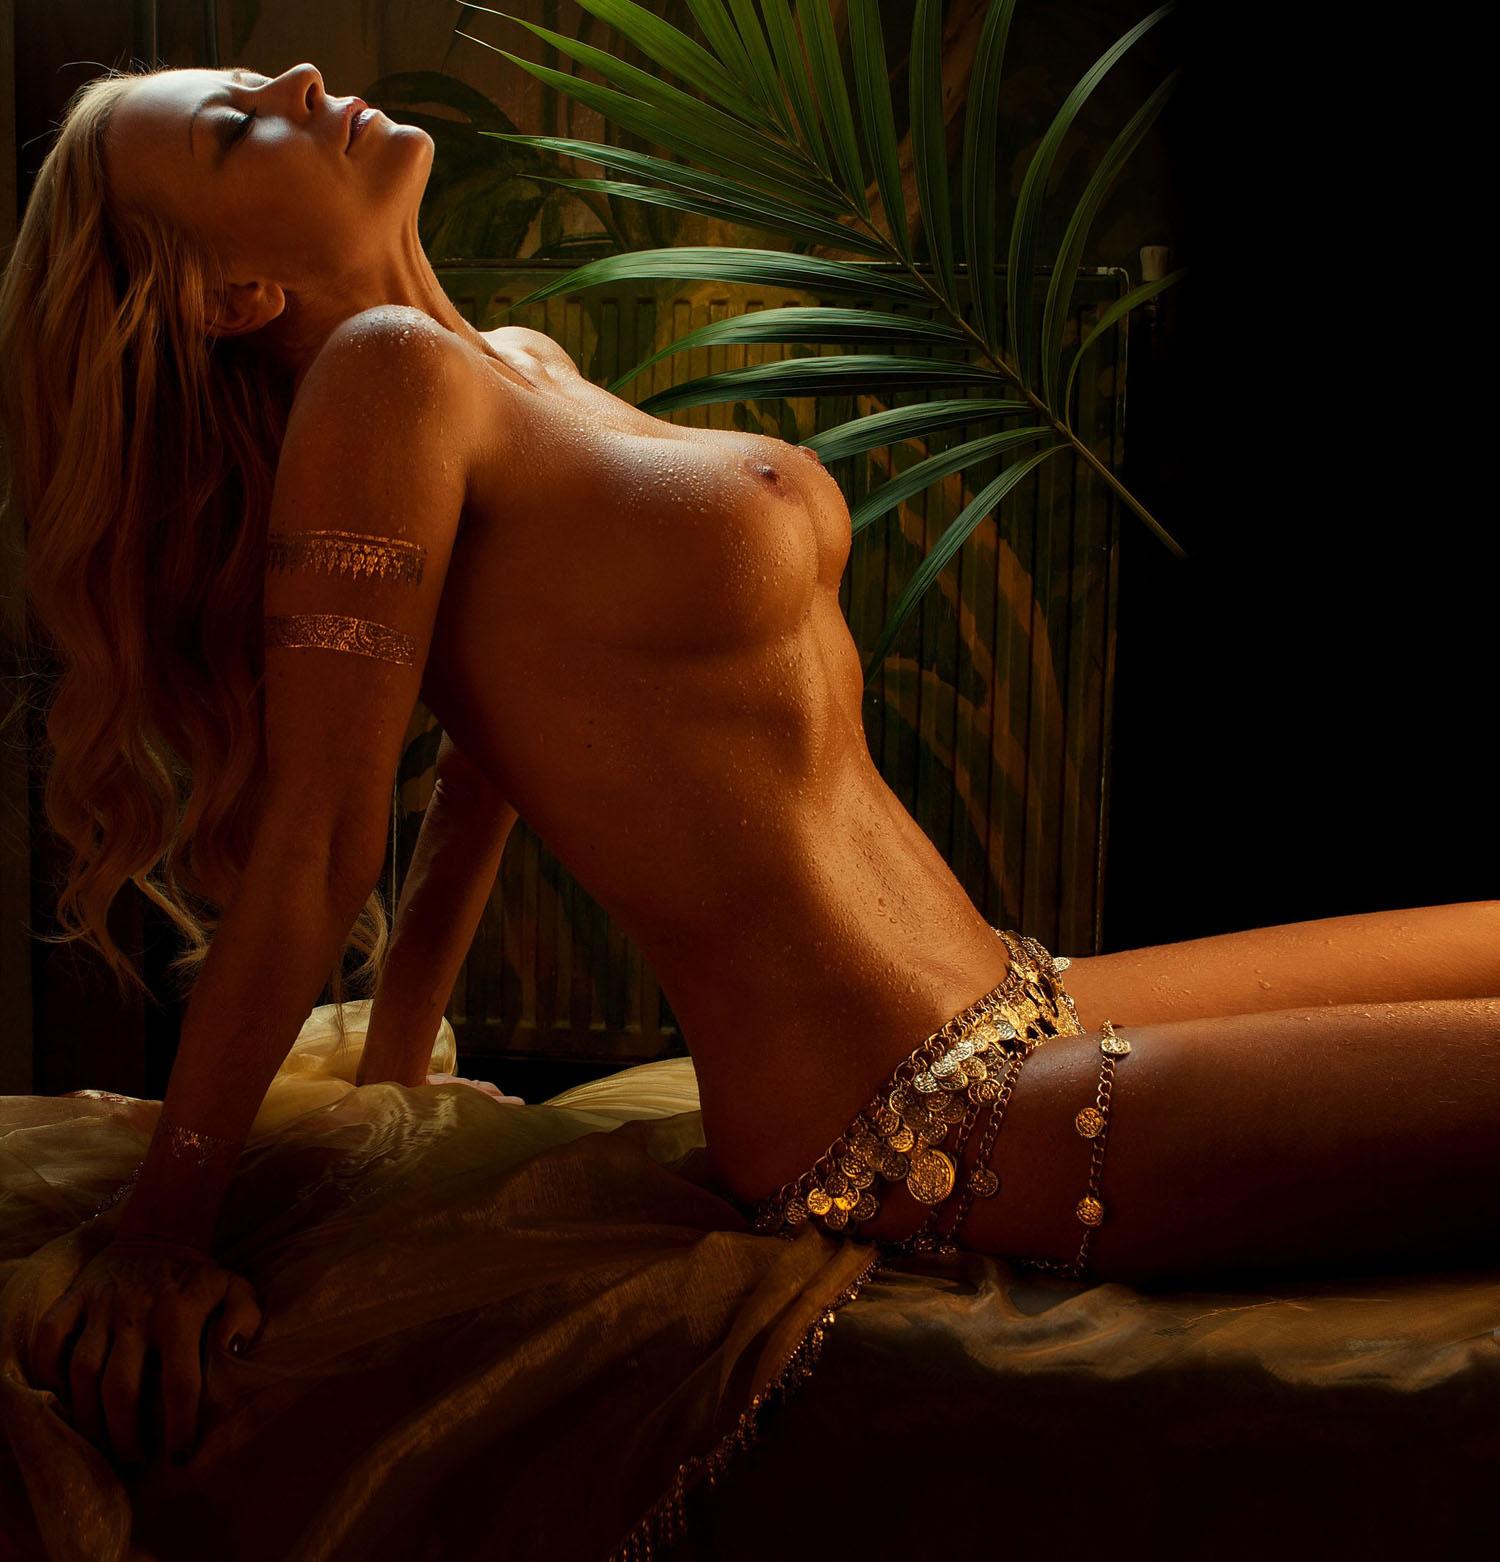 Дженни Элверс голая. Фото - 44